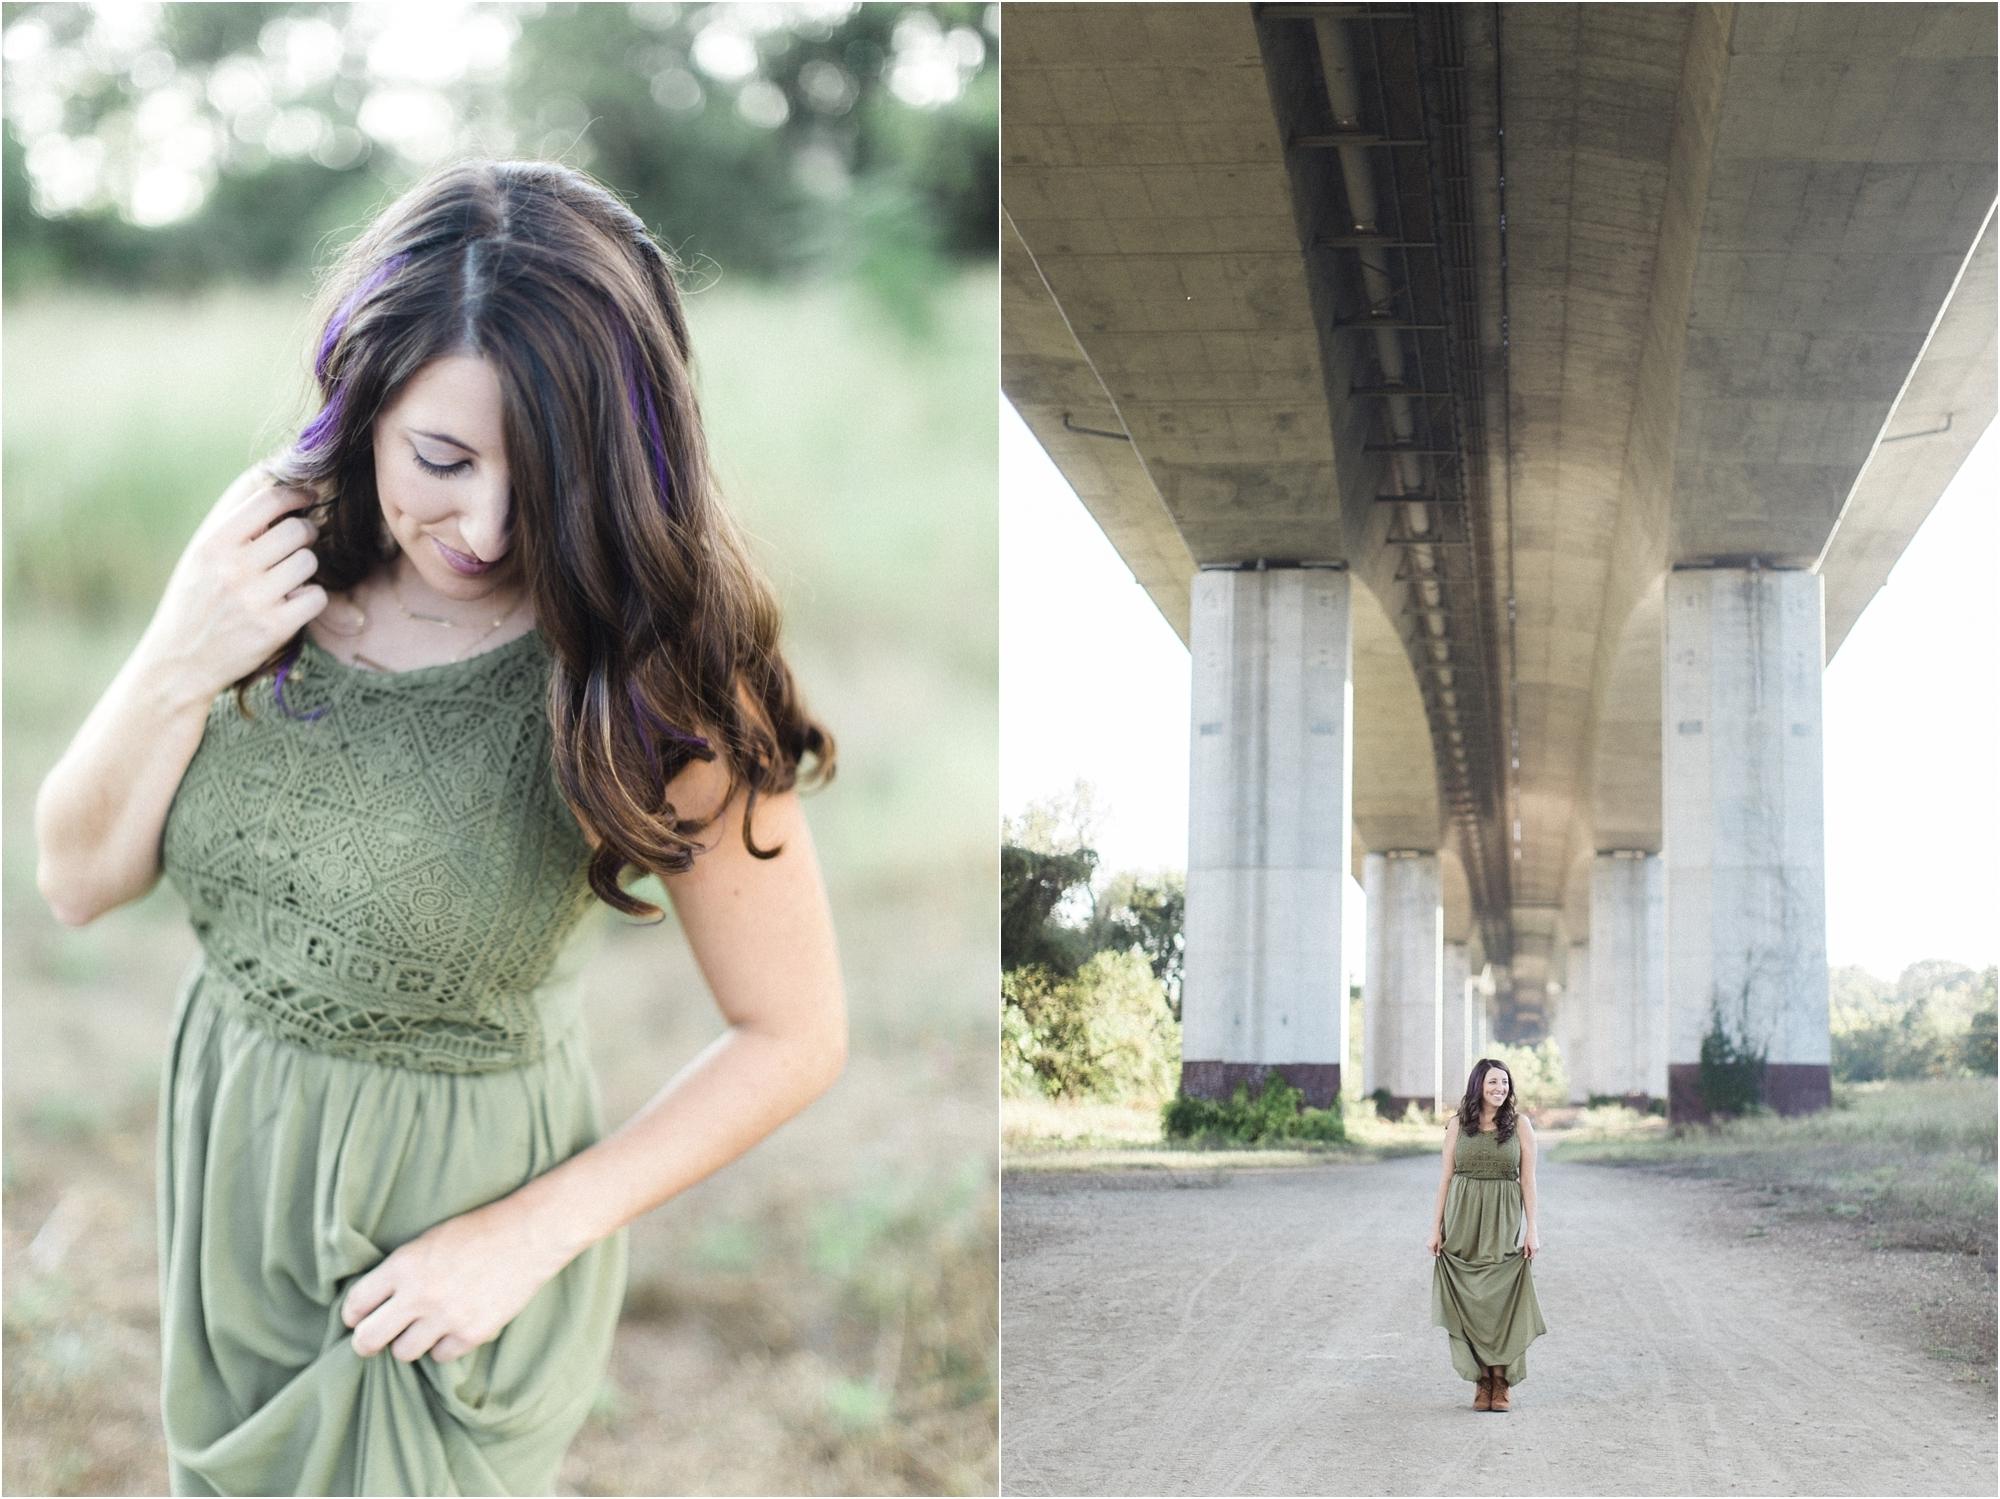 stephanie-yonce-photography-headshots-belle-isle-richmond-va_0004.jpg